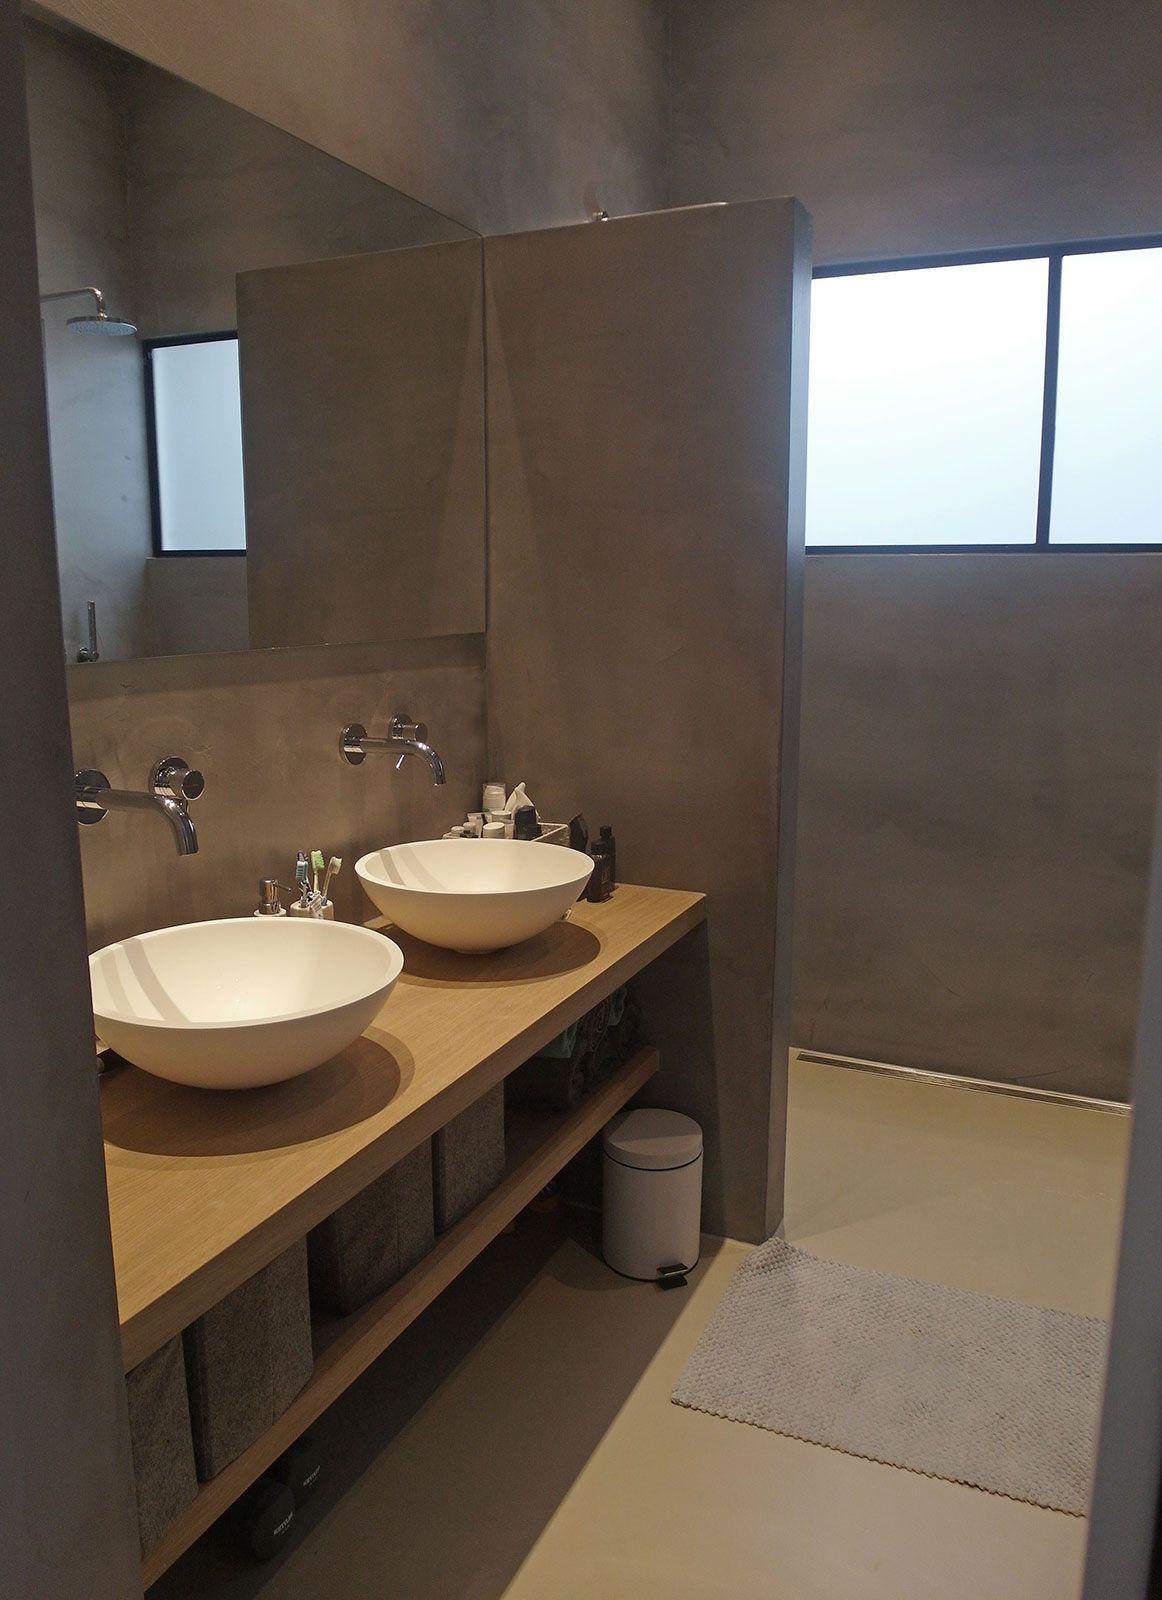 Gietvloer badkamer Amsterdam - Badkamer, Amsterdam en Badkamers